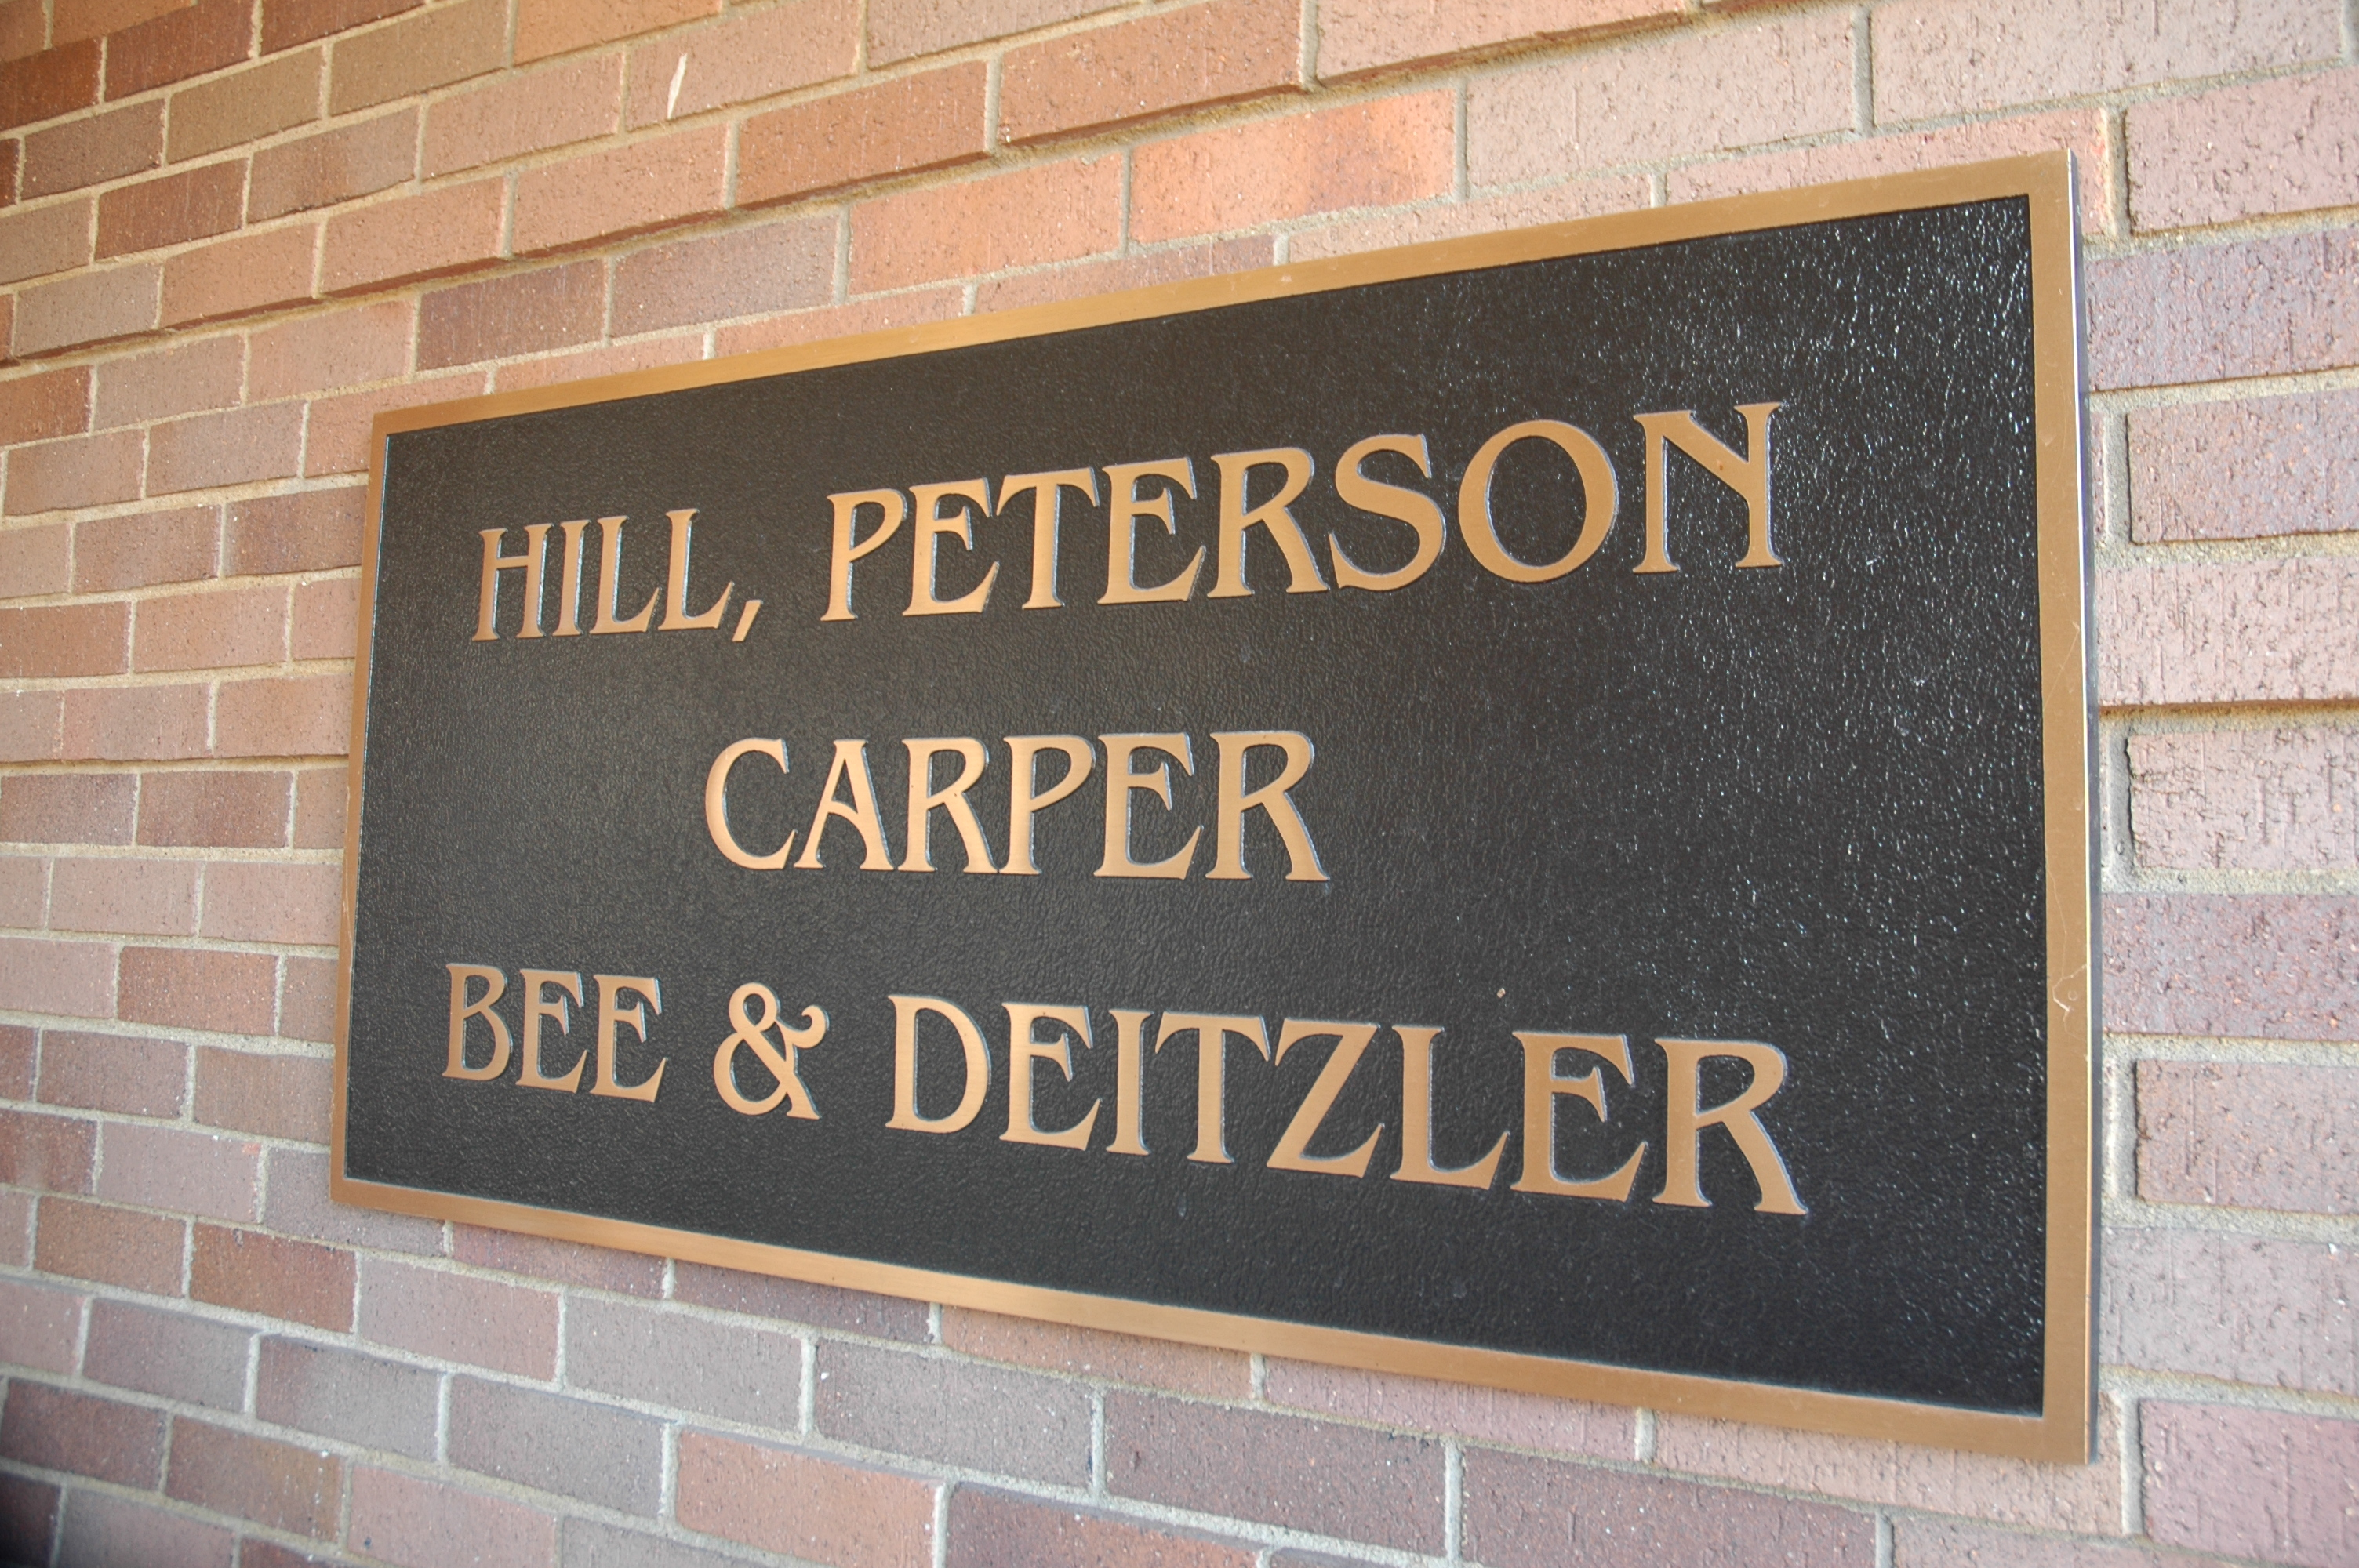 Hill, Peterson, Carper, Bee & Deitzler, PLLC image 1